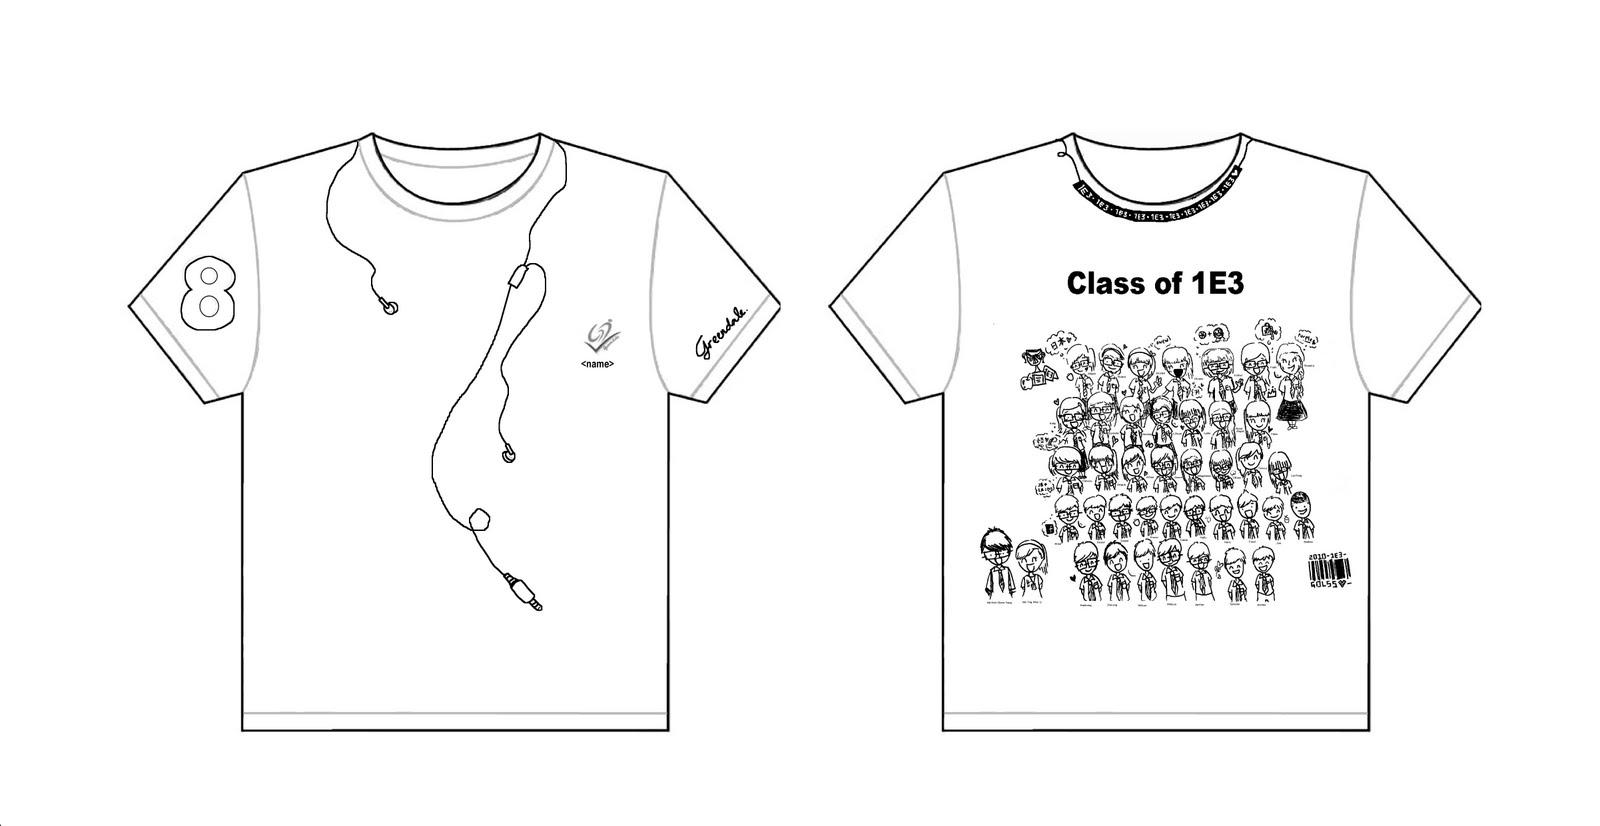 School Class T Shirt Design Ideas Bcd Tofu House